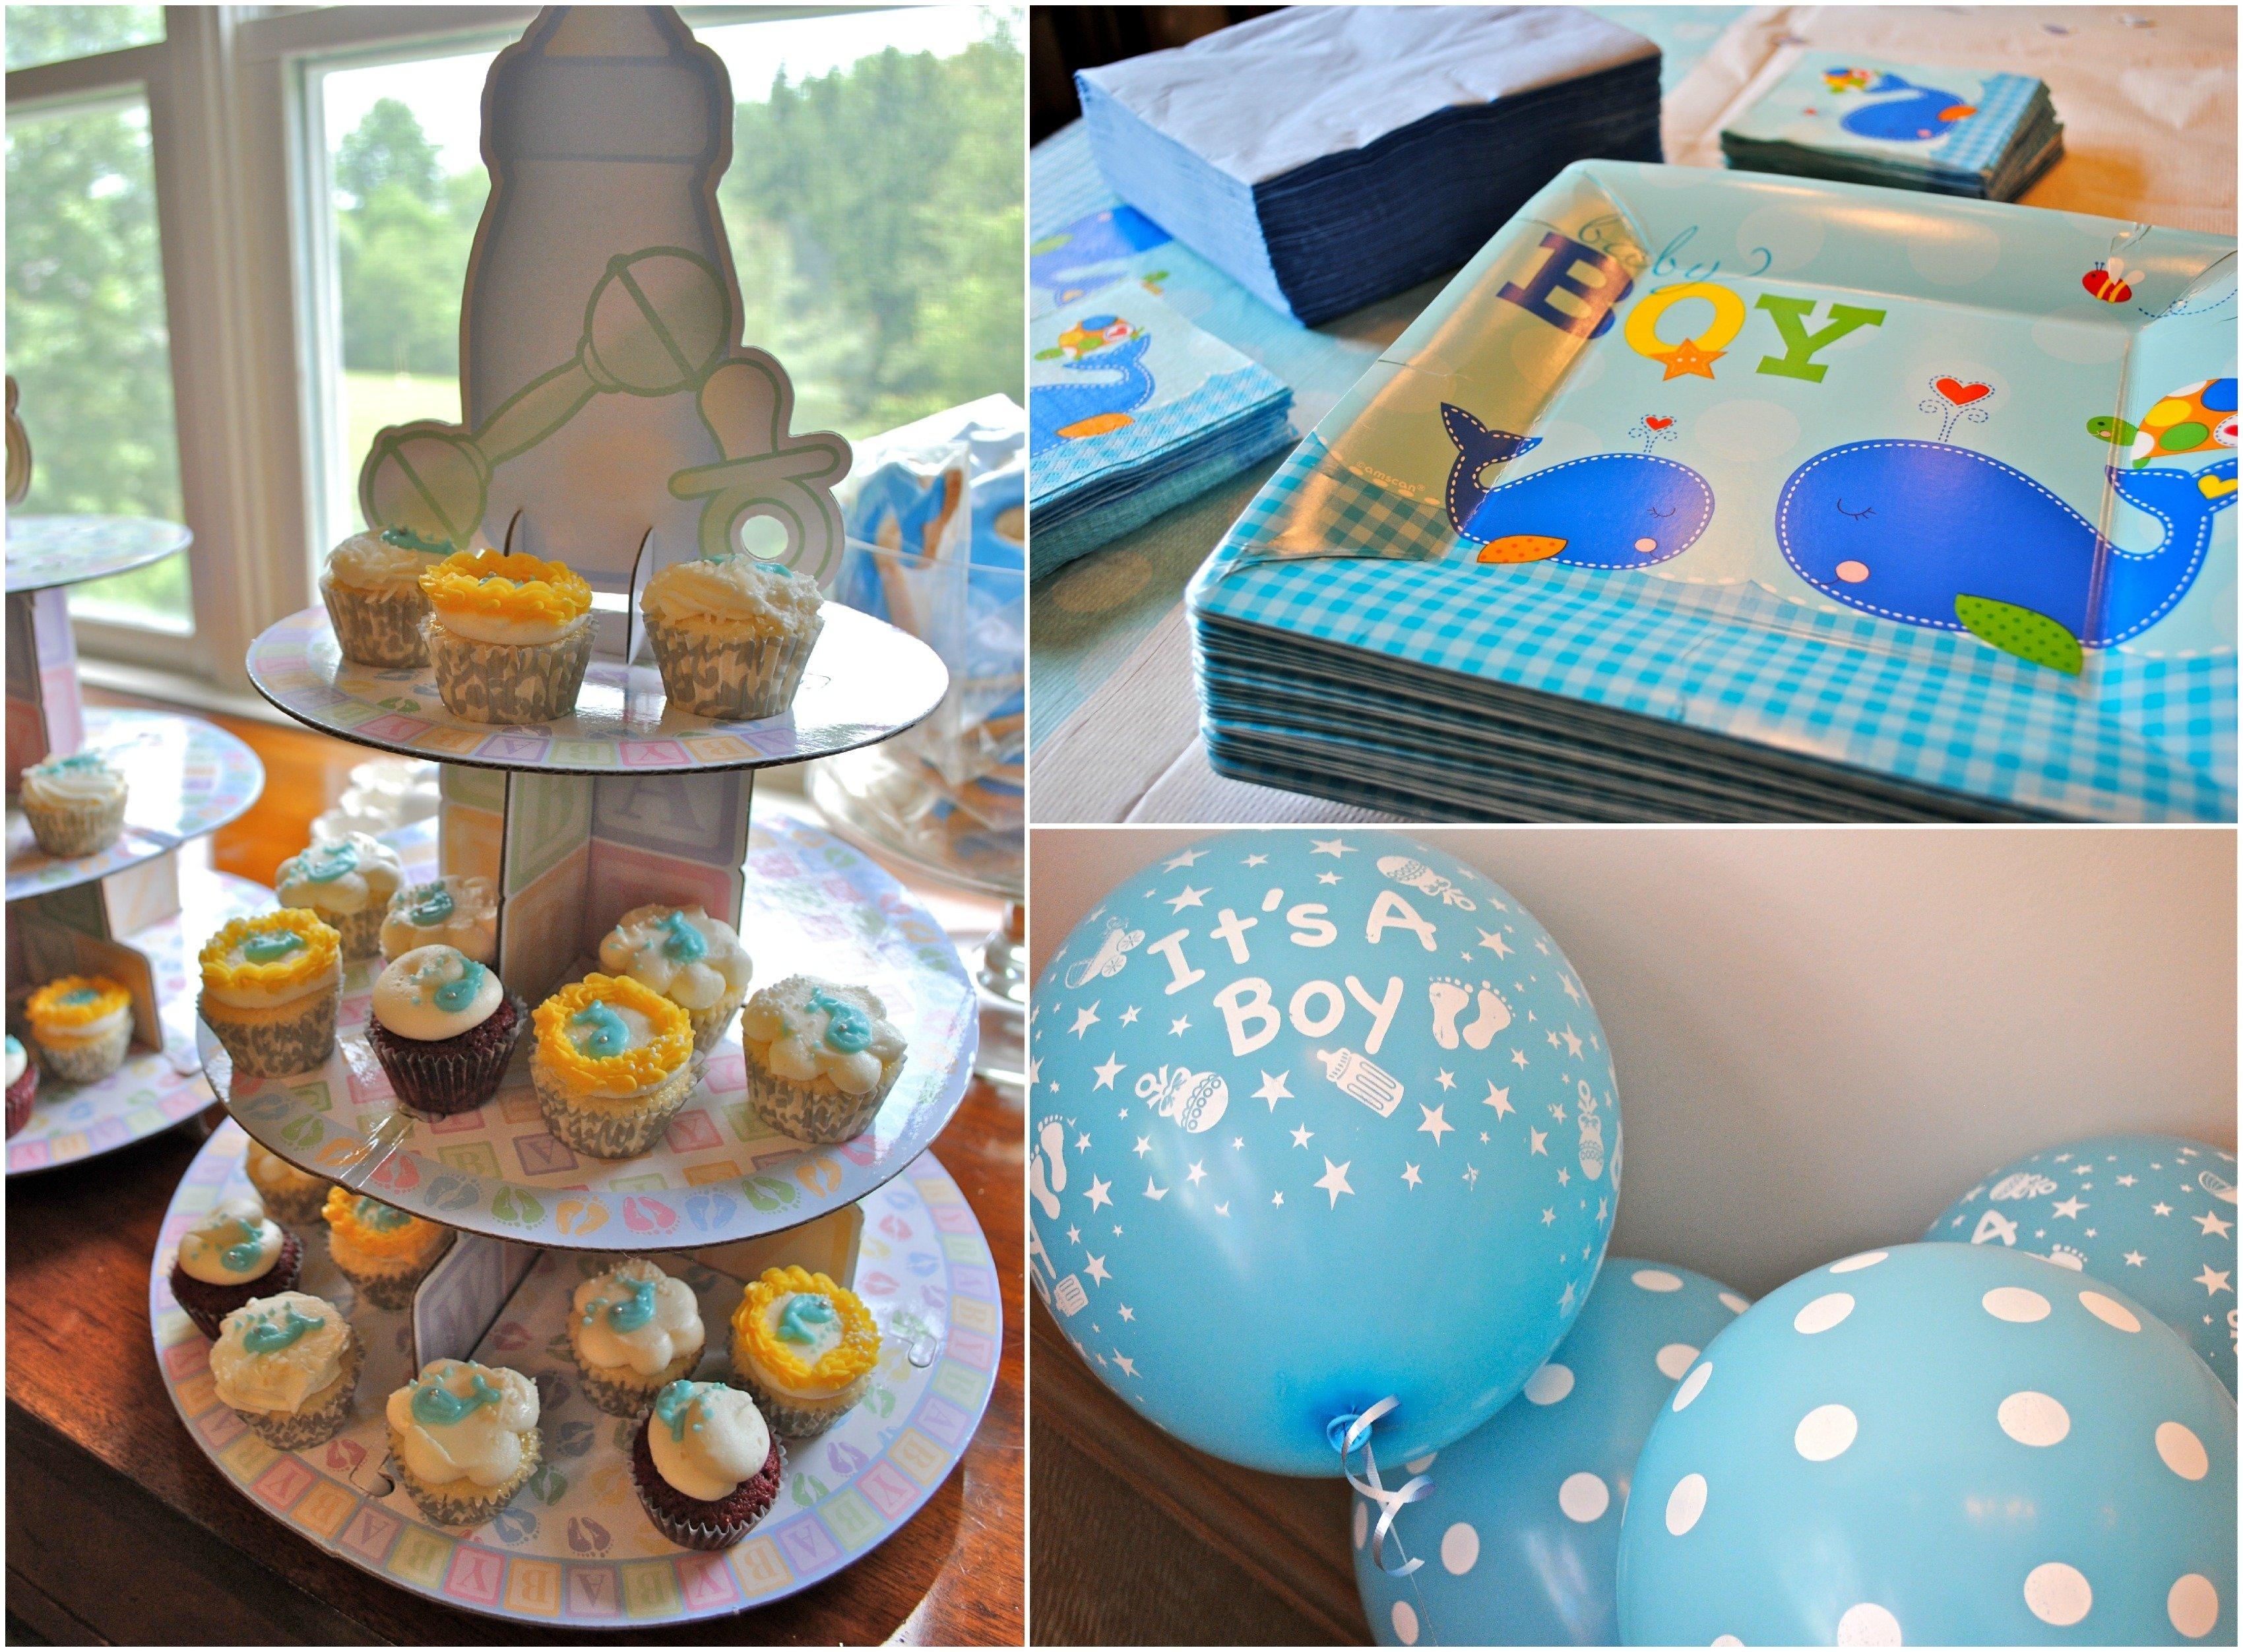 10 Amazing Baby Shower Ideas For Boy baby shower ideas elephant bridal party excerpt boy themes loversiq